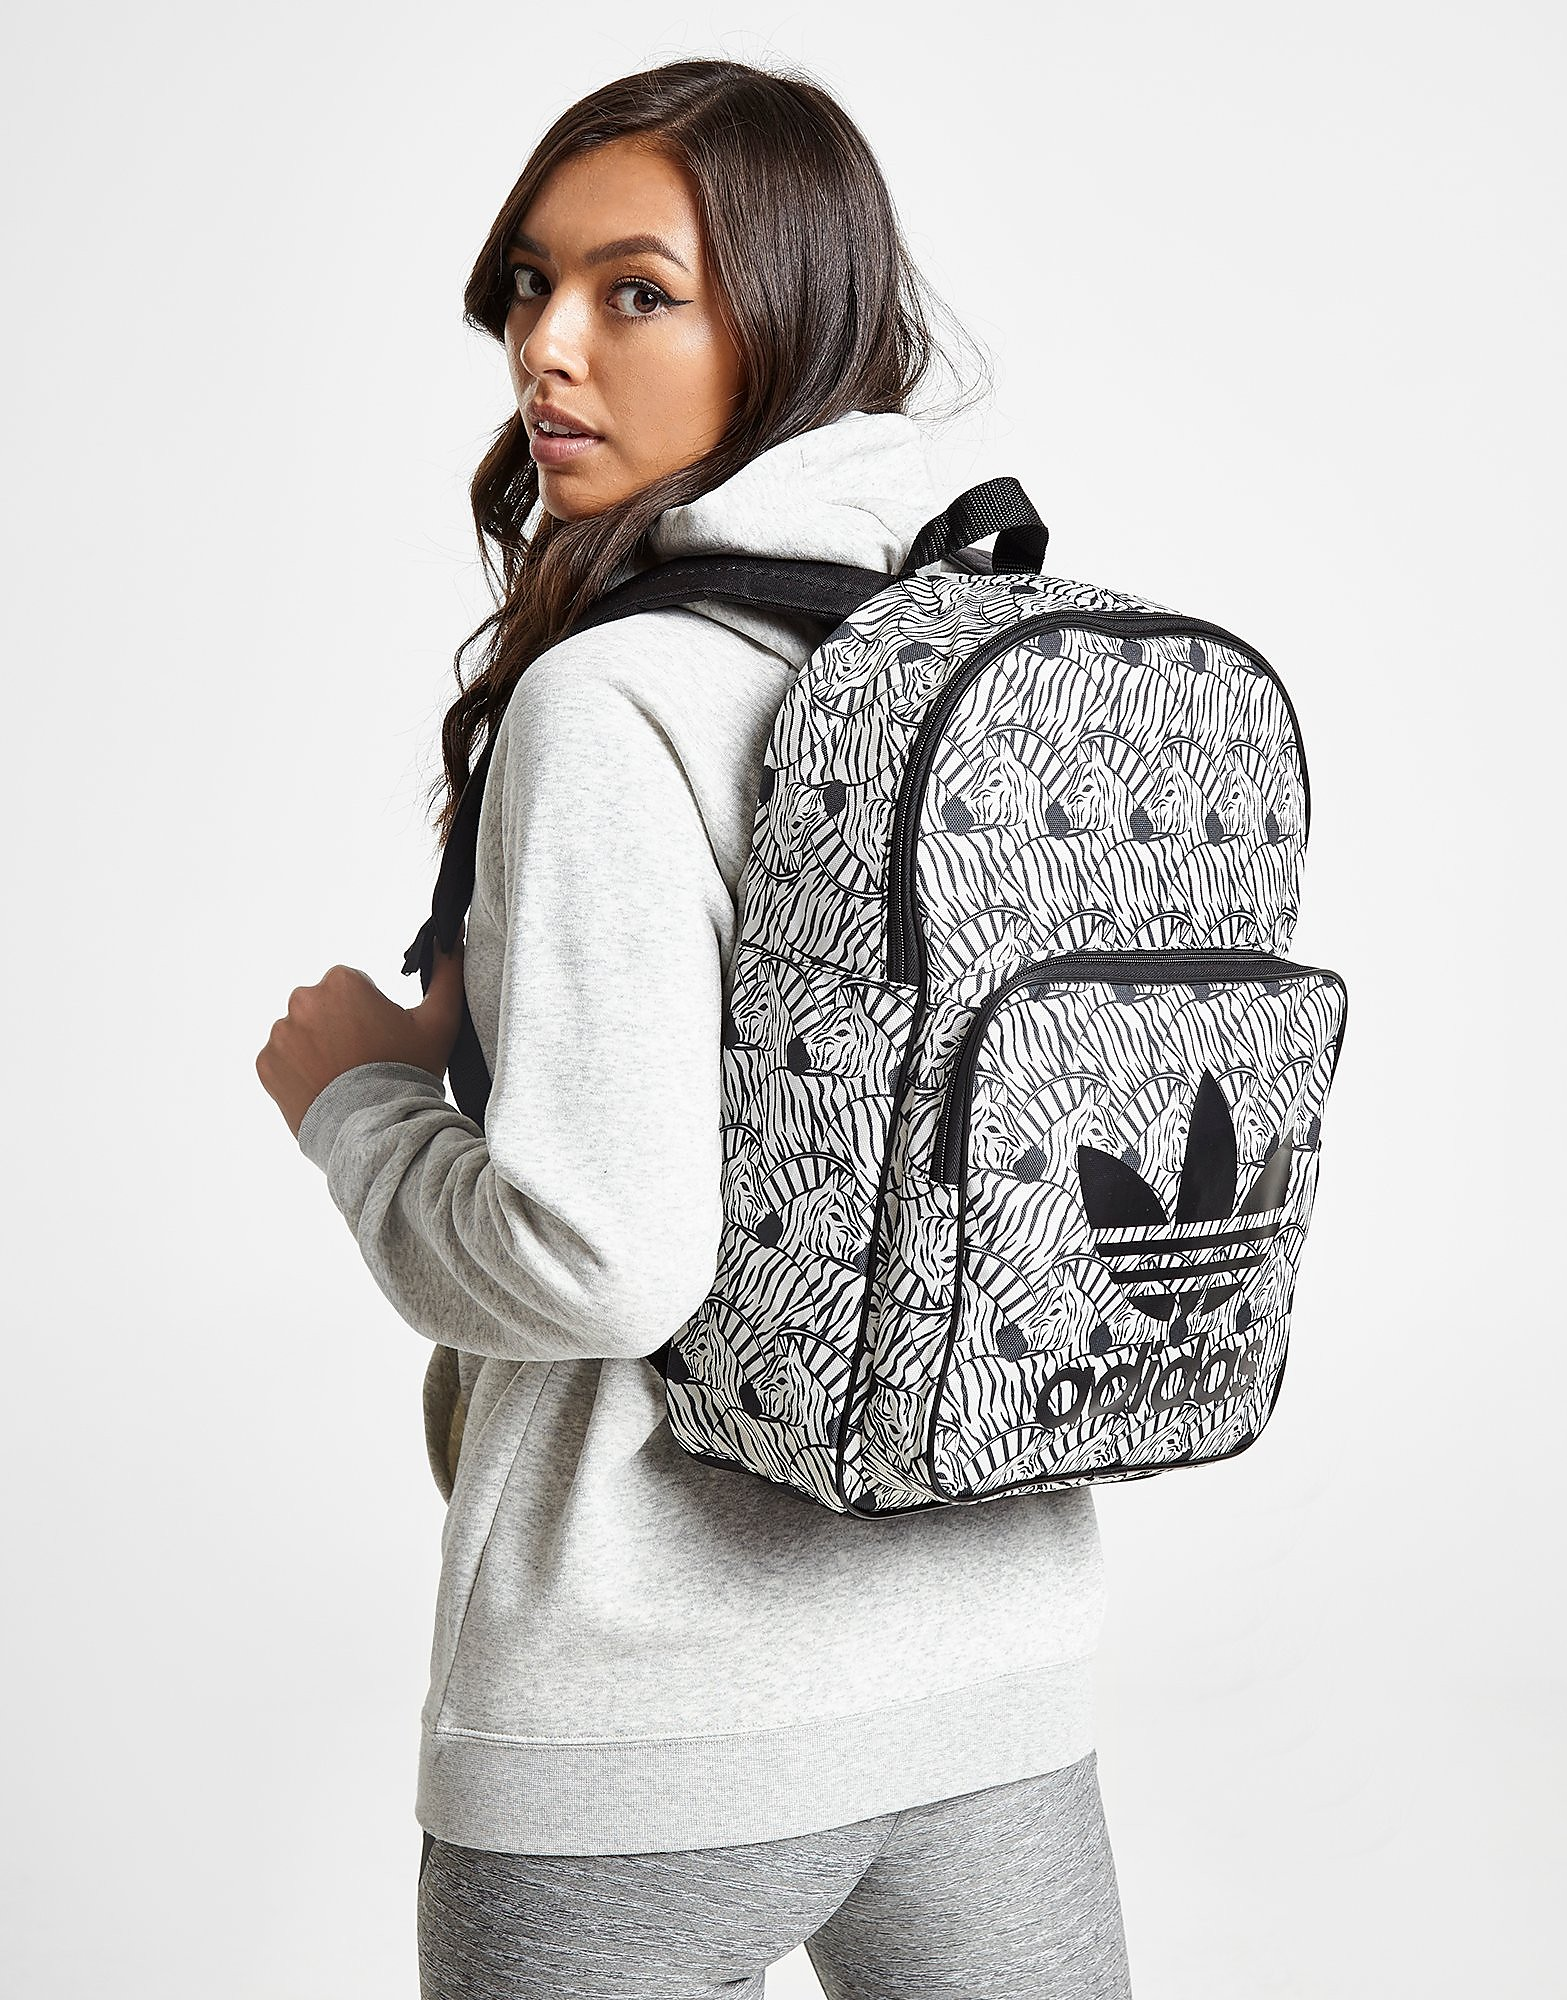 Adidas rugzak zwart en wit